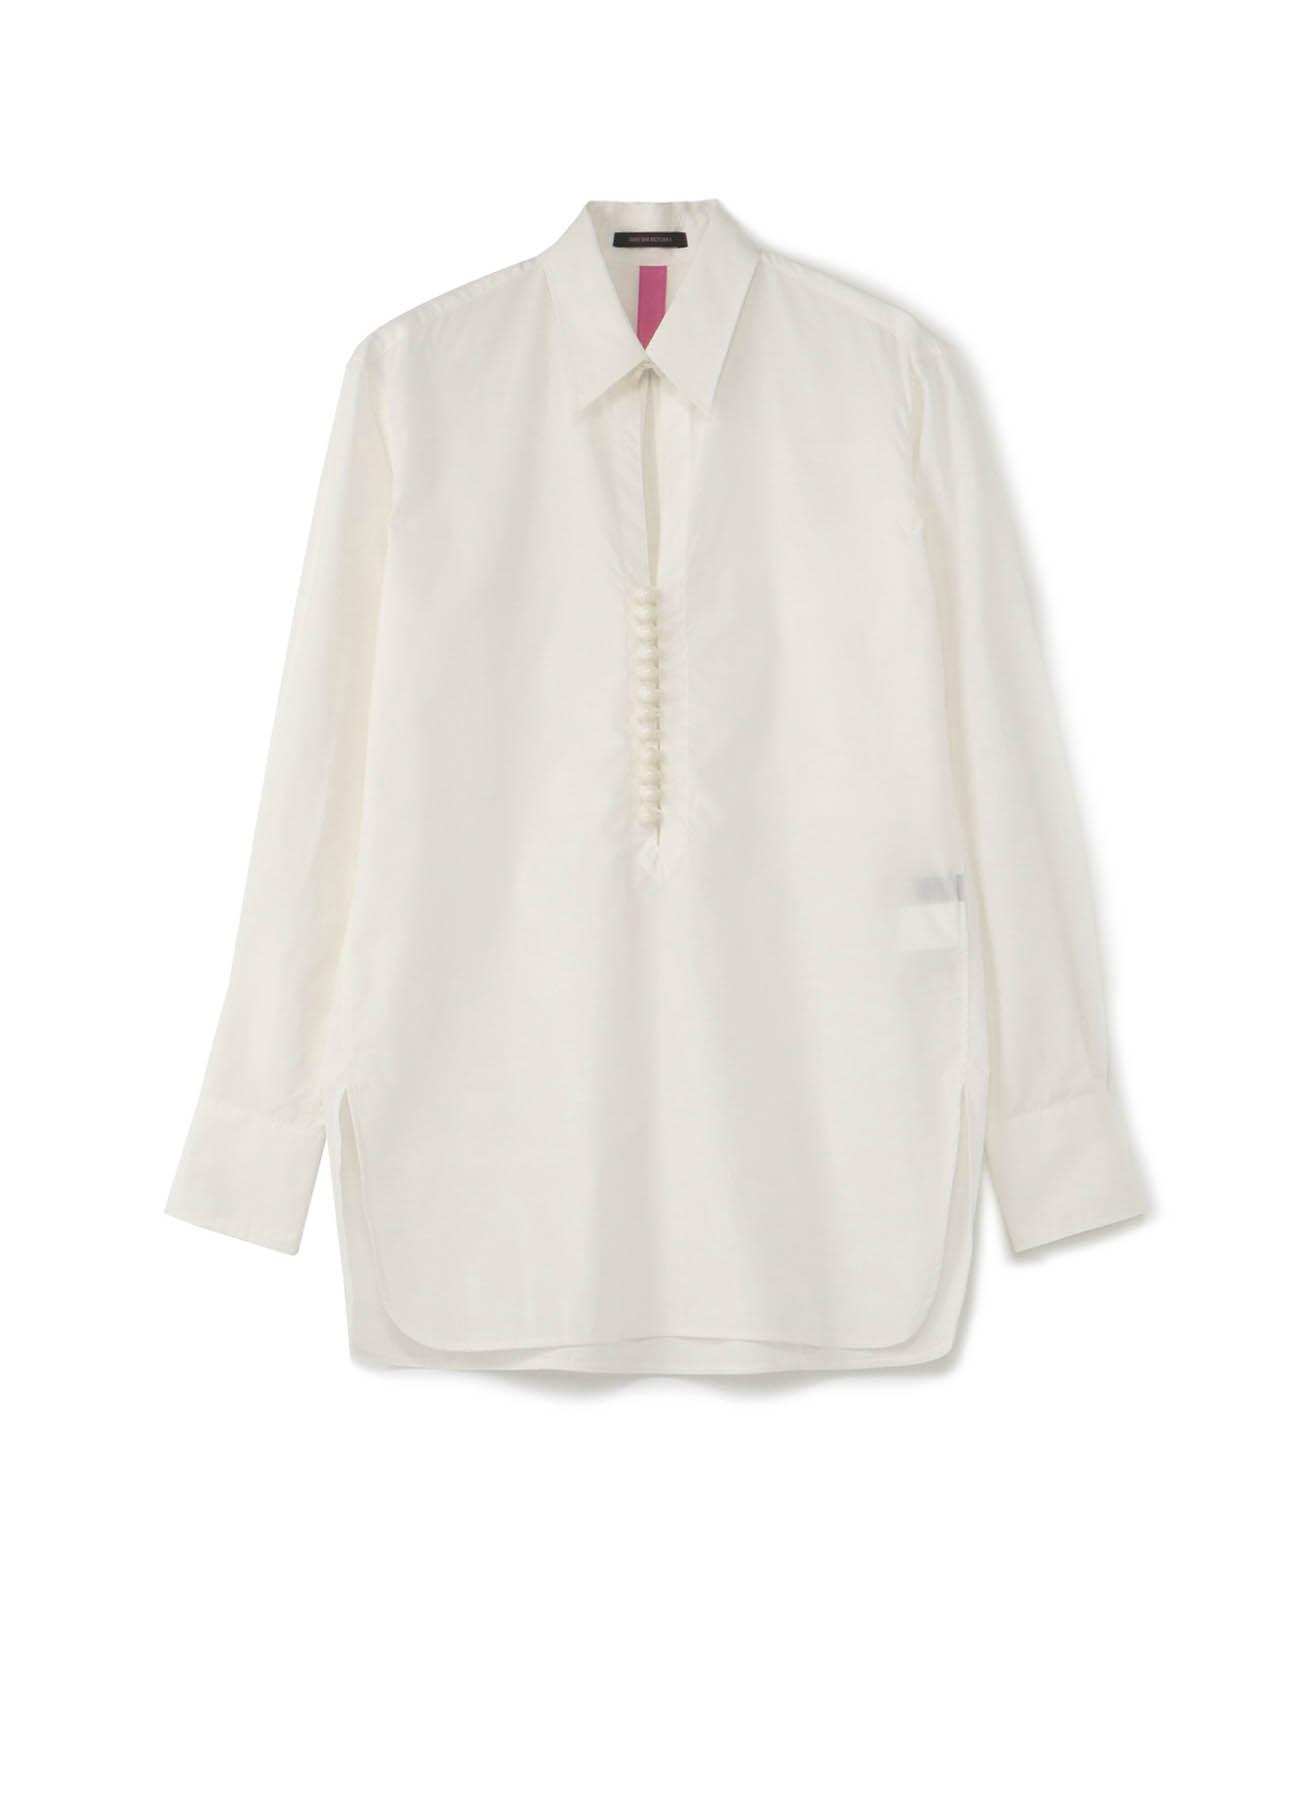 Y'sPINK 棉·混纺 球形纽扣衬衫